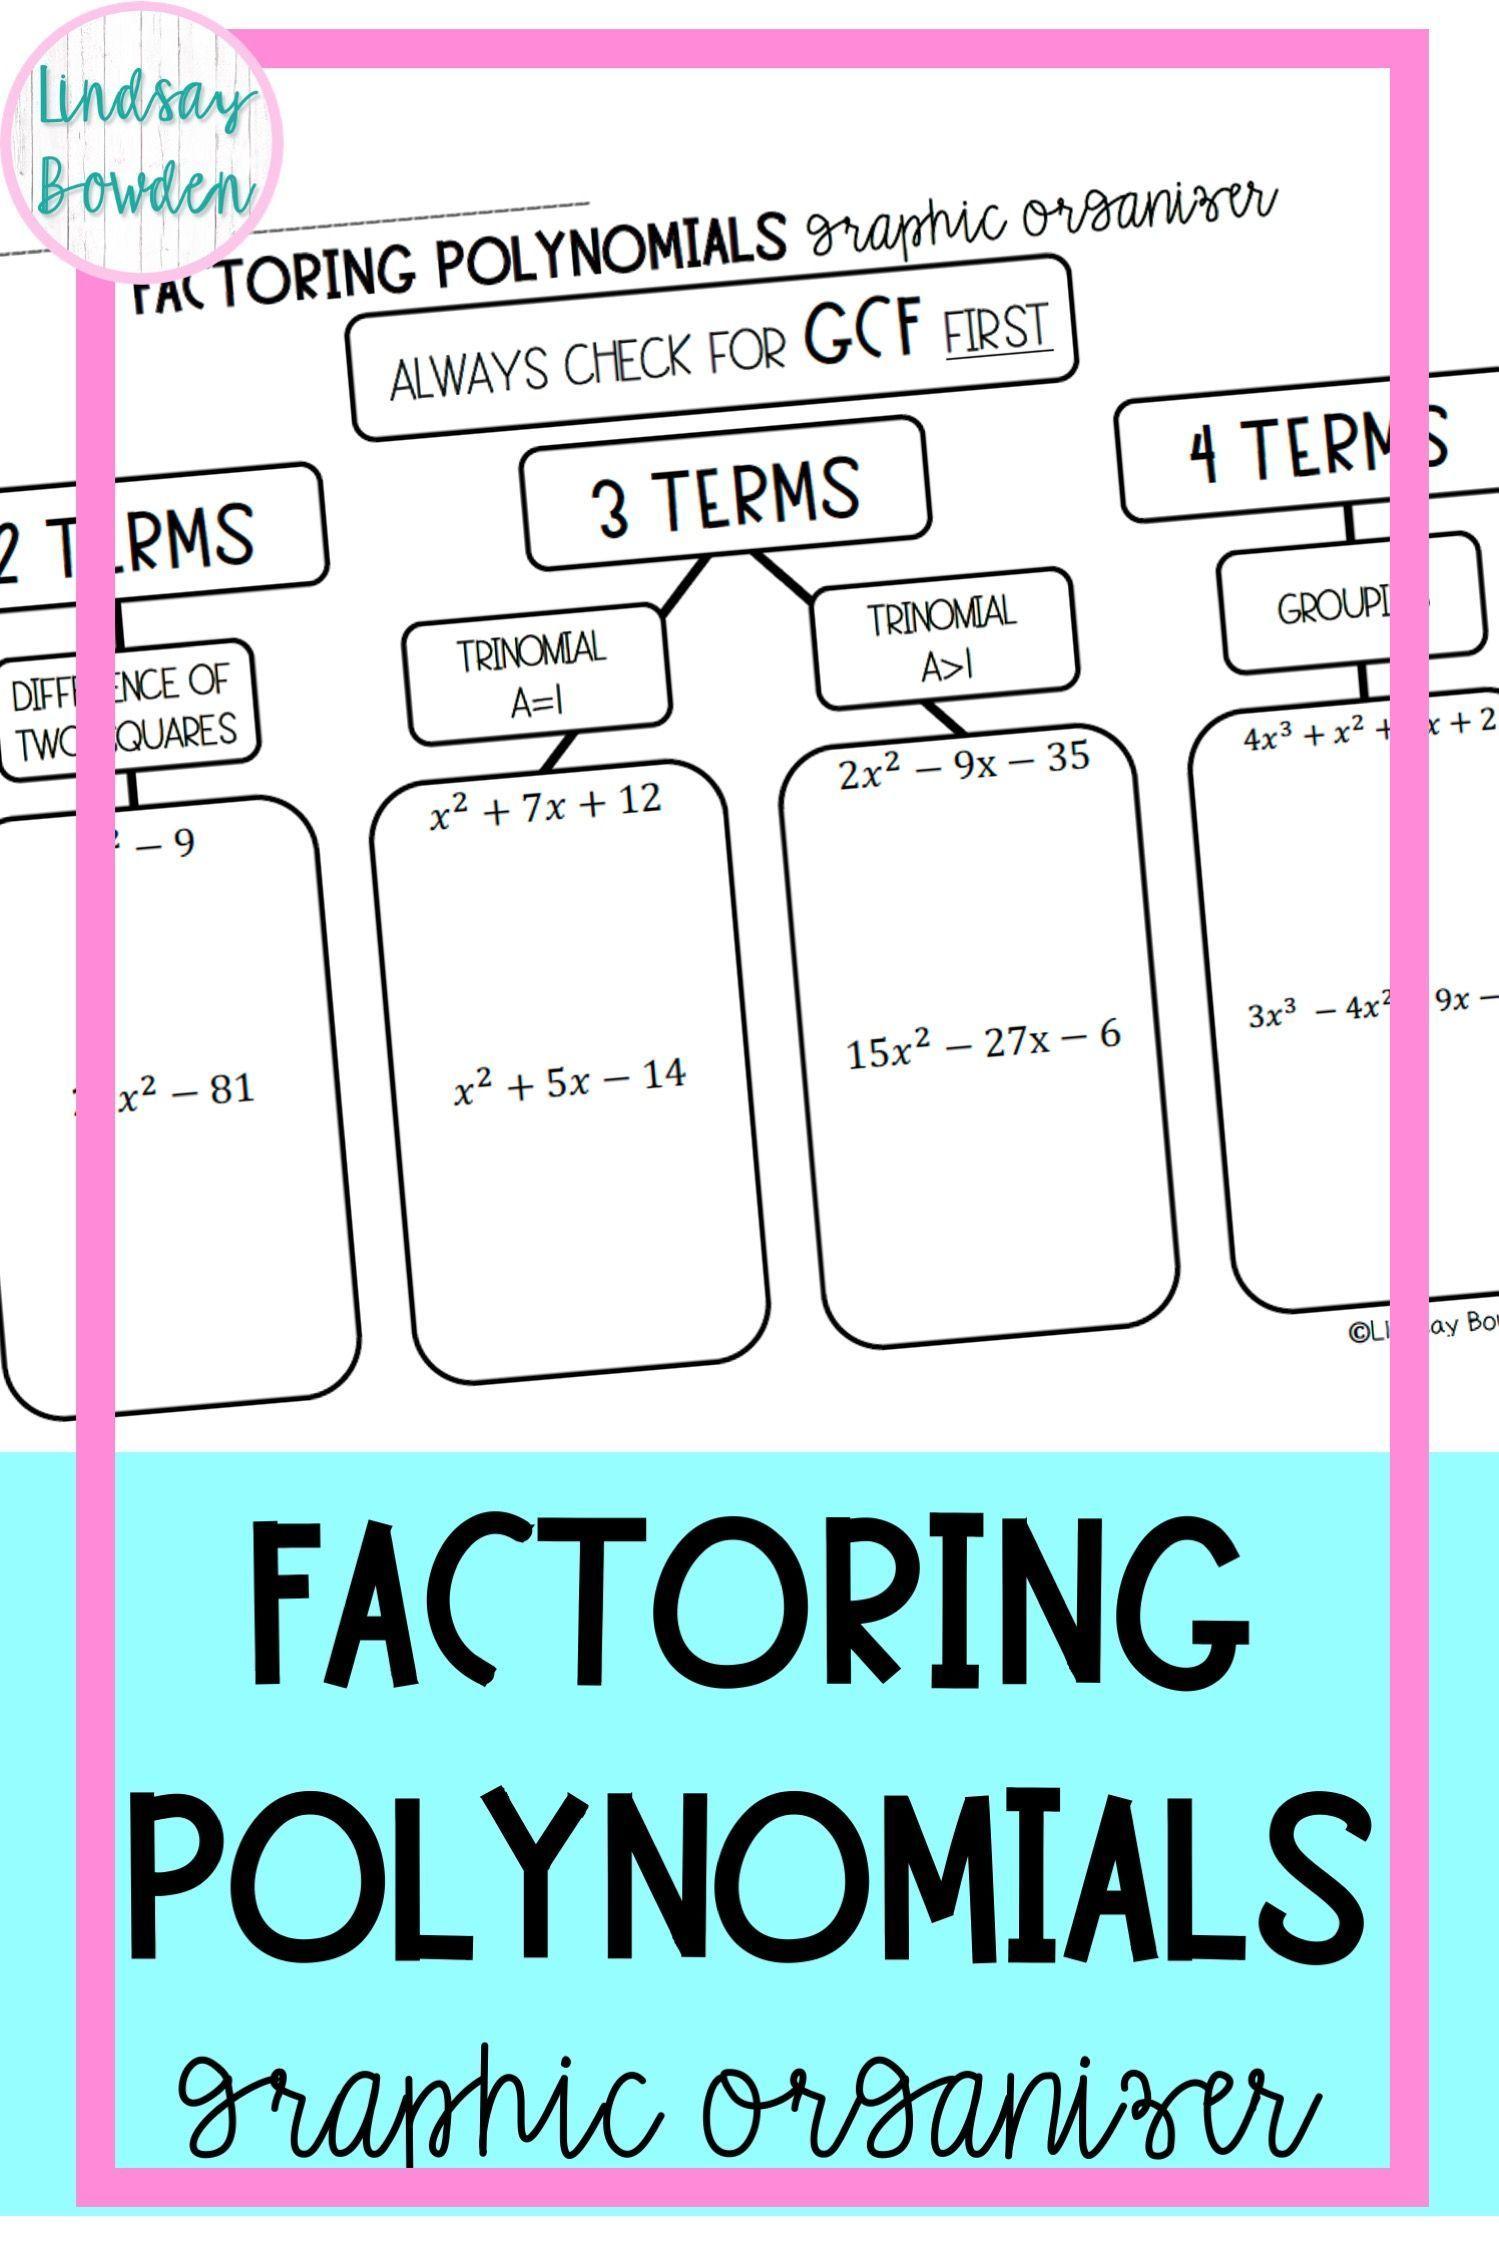 Factoring Polynomials Graphic Organizer In